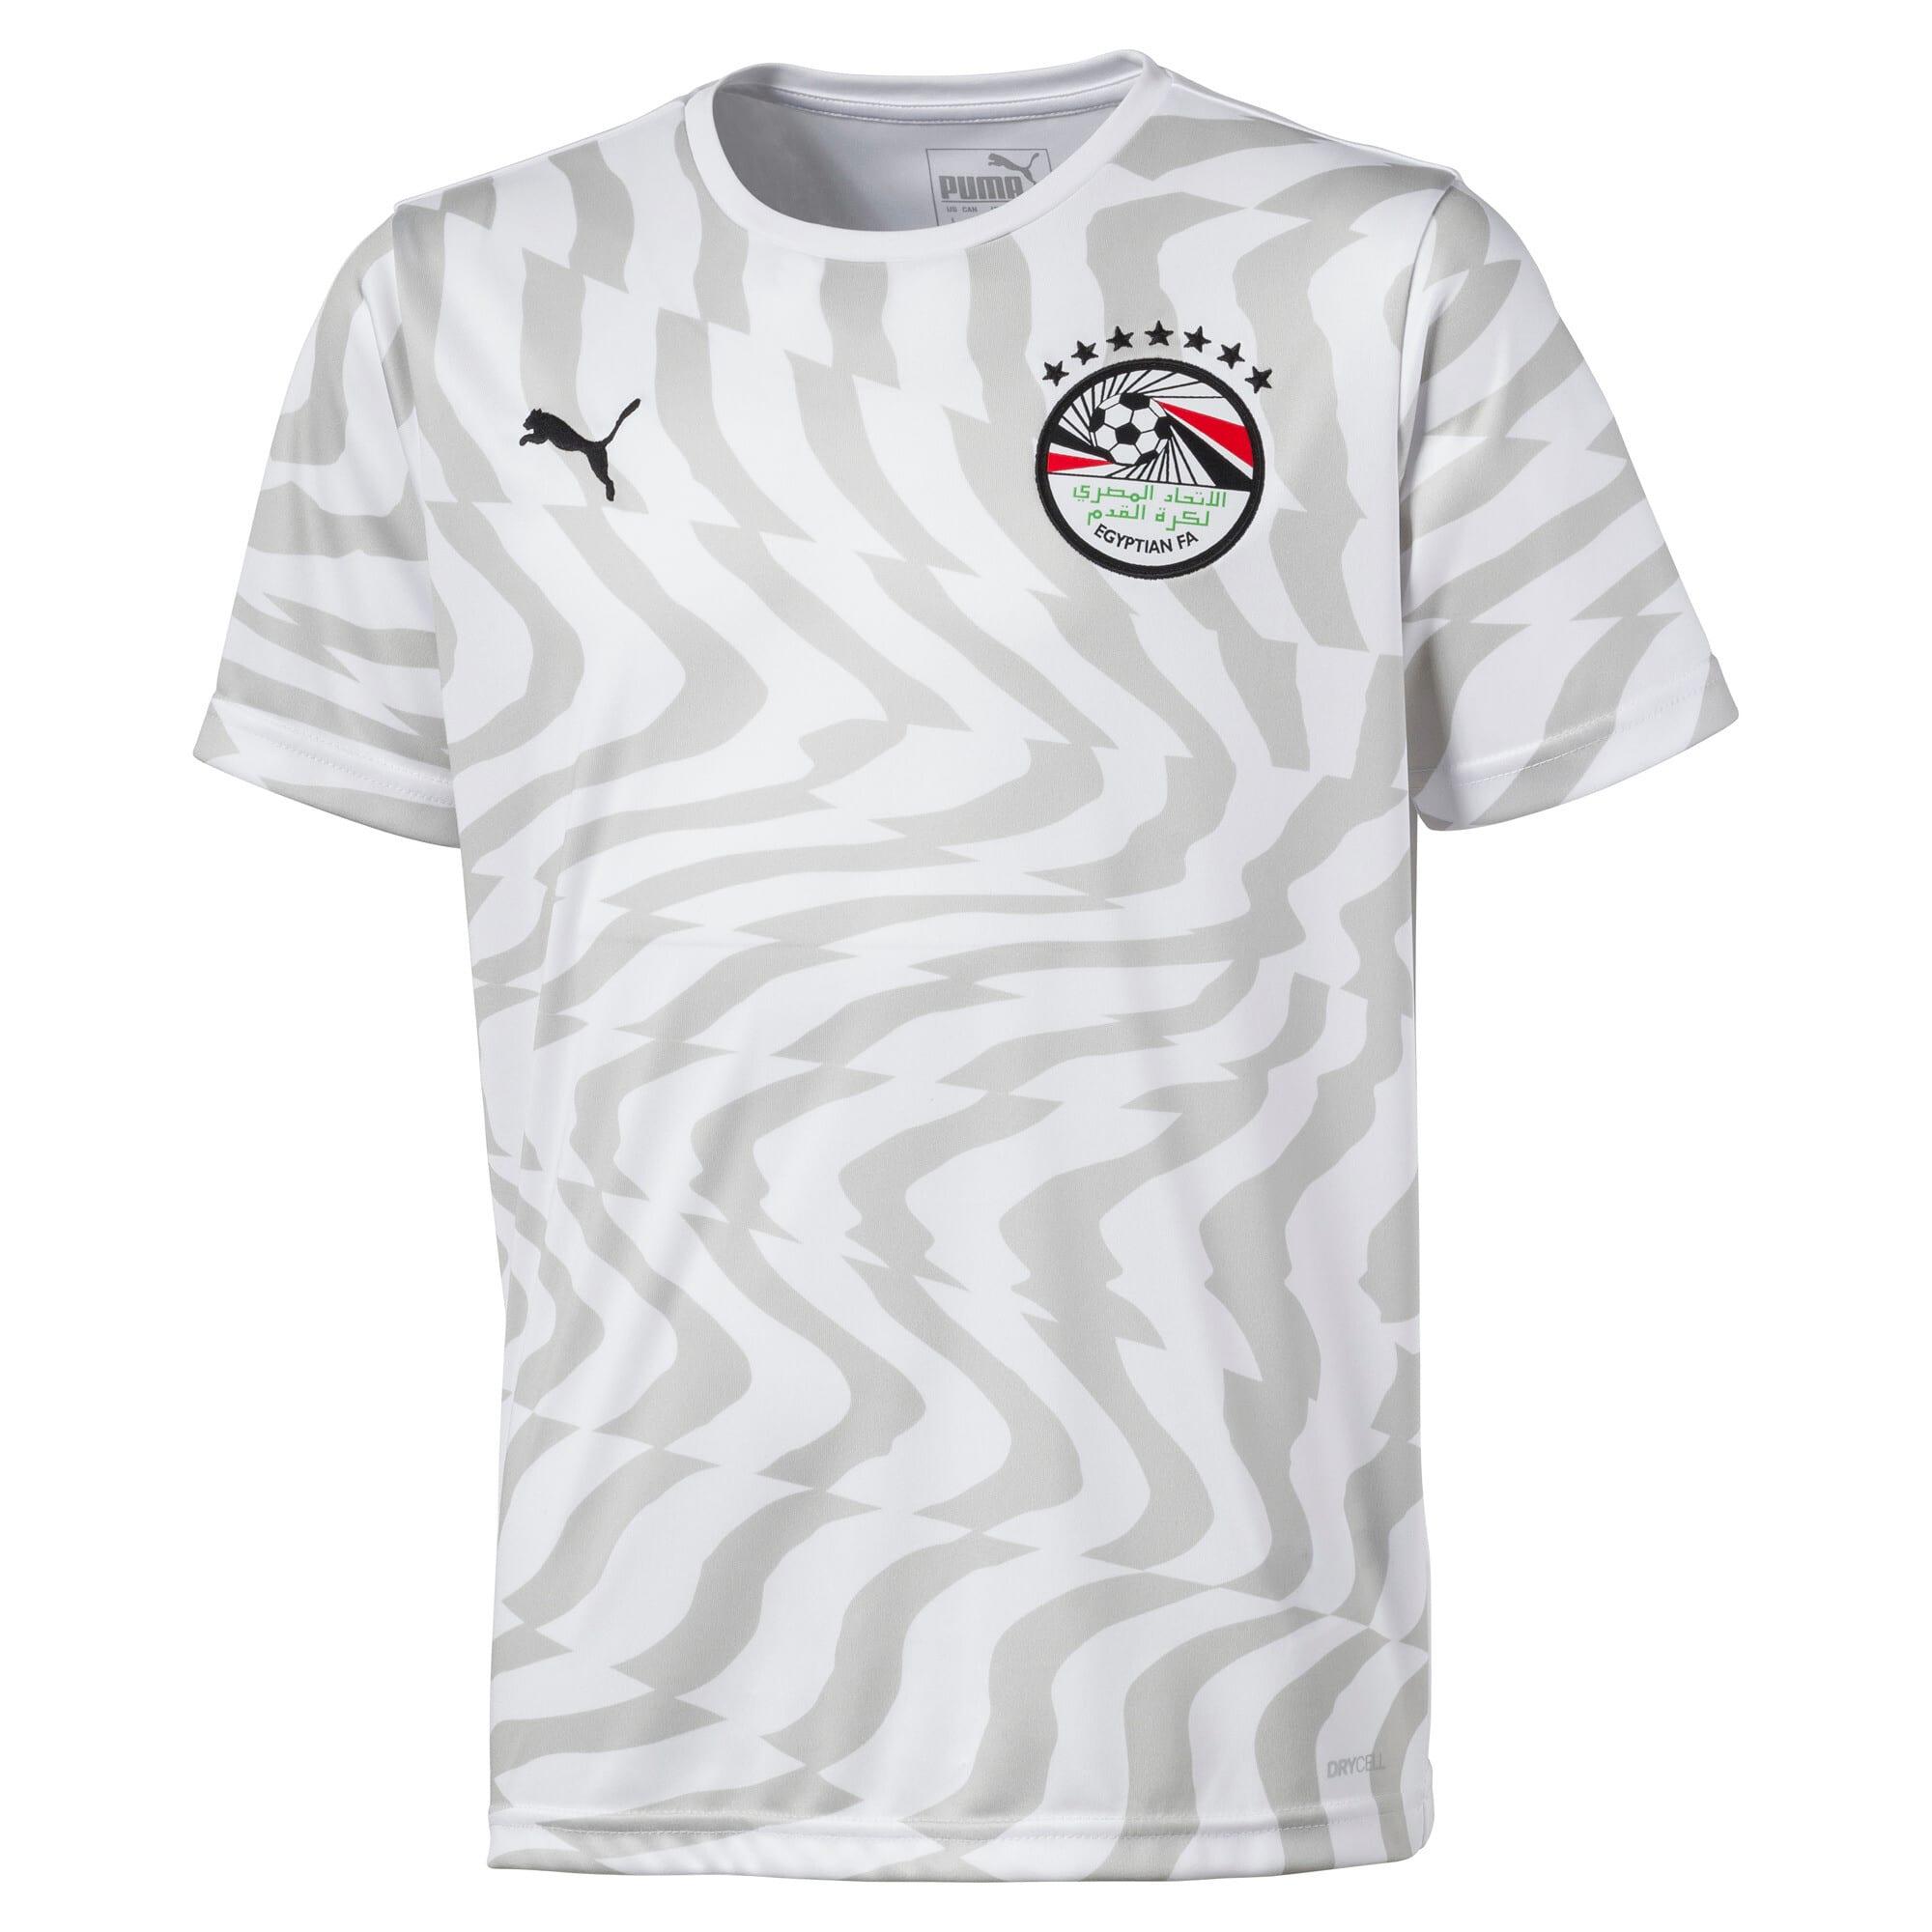 Thumbnail 1 of Egypt Kids' Away Replica Jersey, Puma White-Puma Black, medium